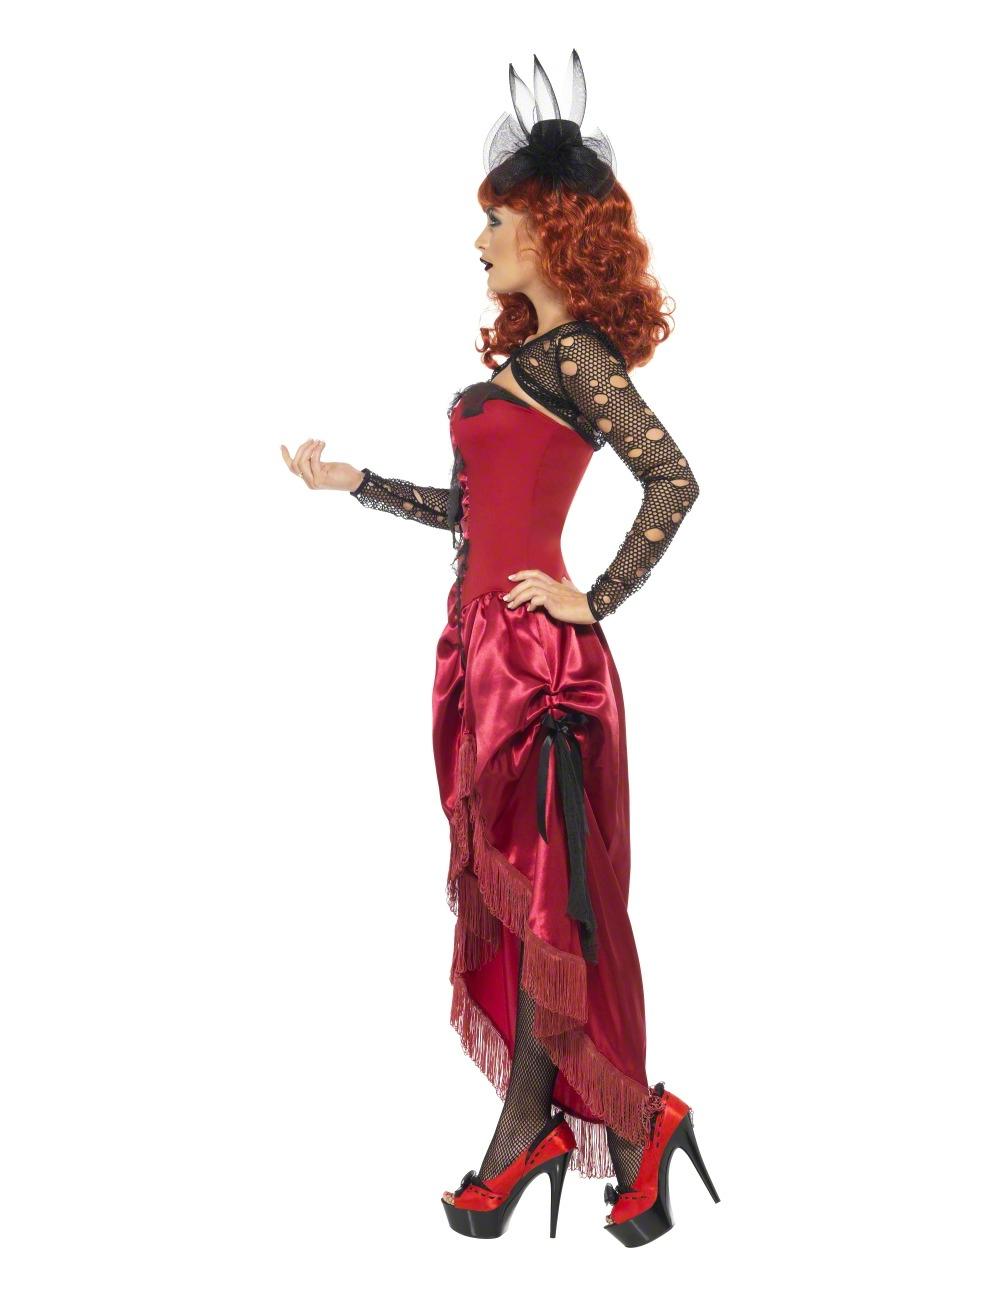 d guisement danseuse cabaret femme halloween deguise toi. Black Bedroom Furniture Sets. Home Design Ideas